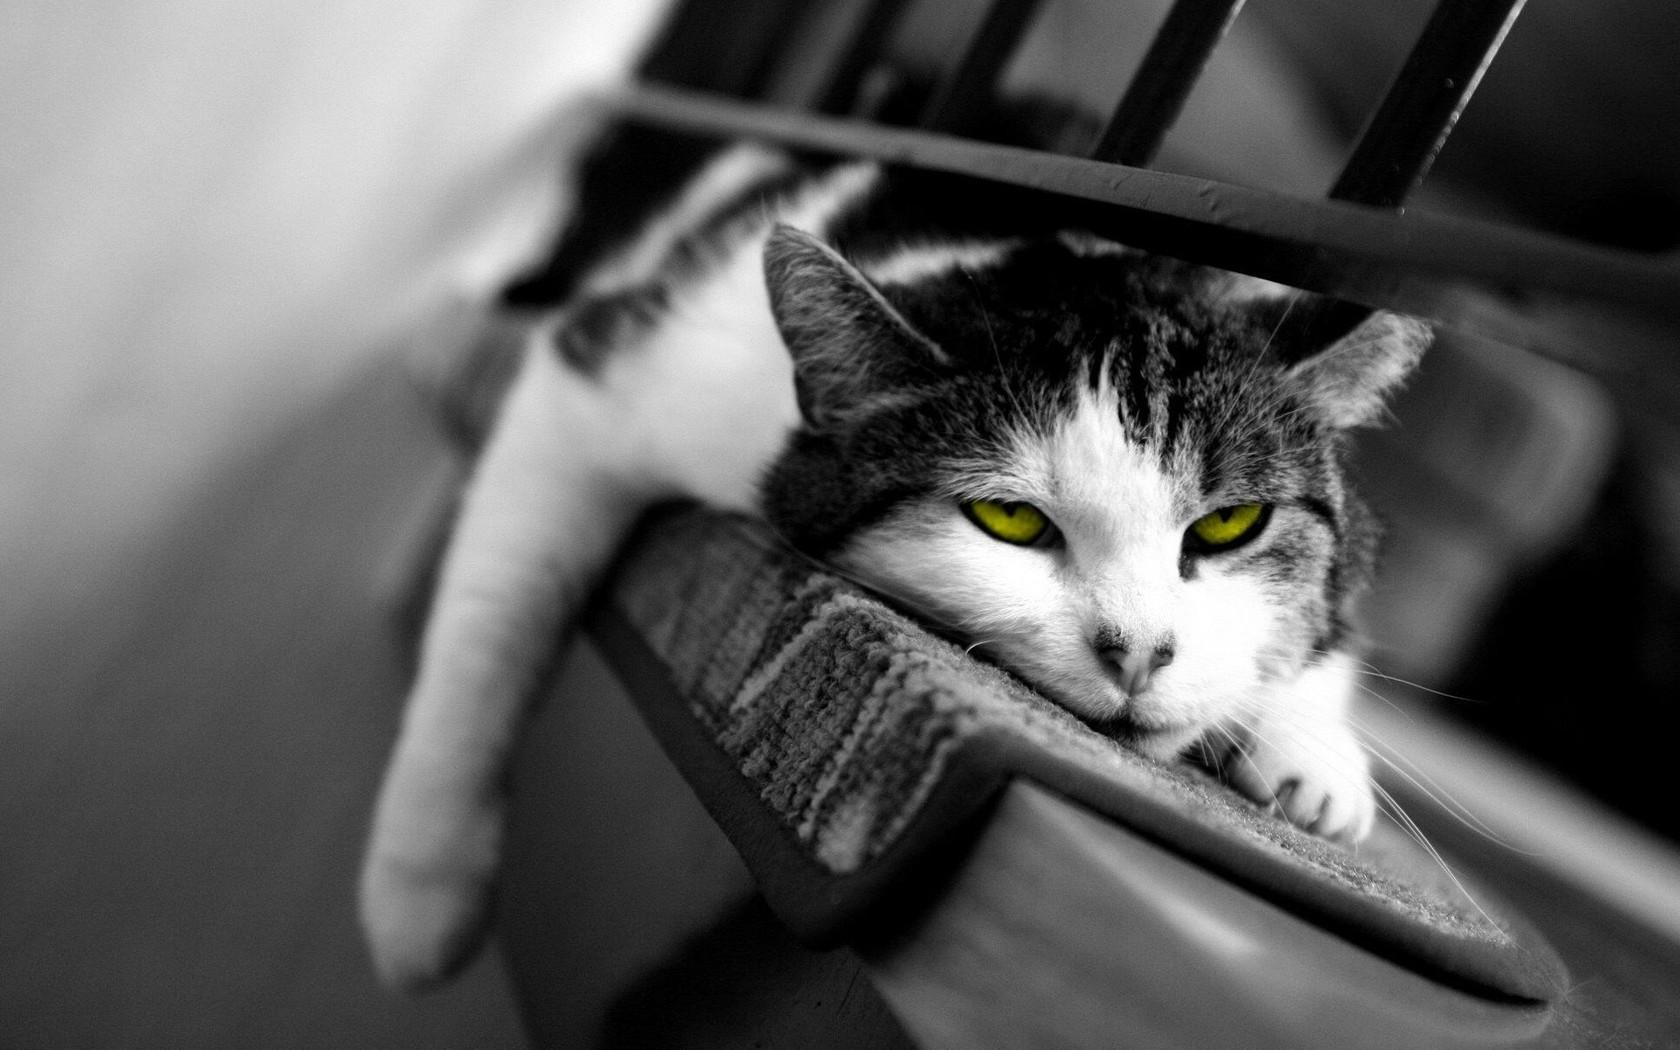 Обои Домашний кот на отдыхе фото.